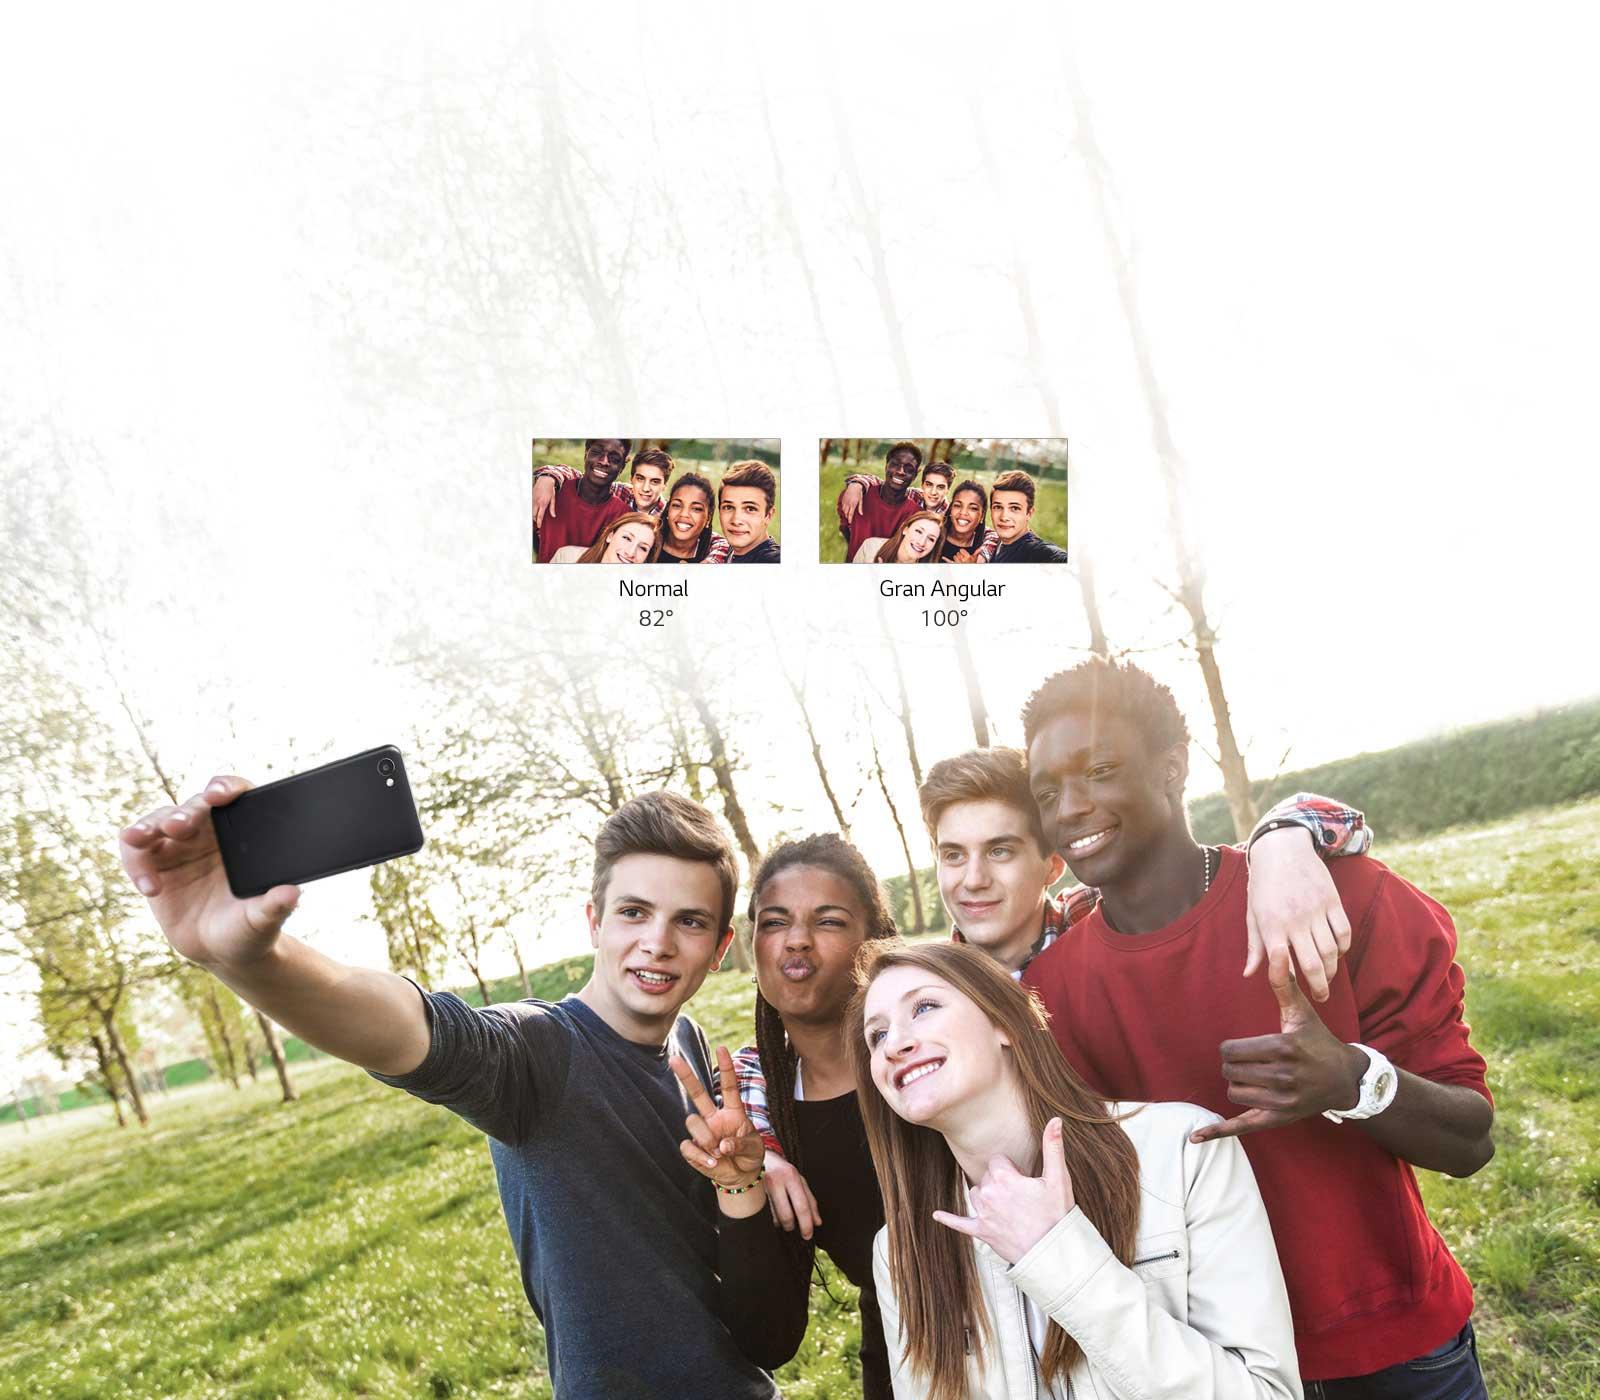 Selfie con gran angular